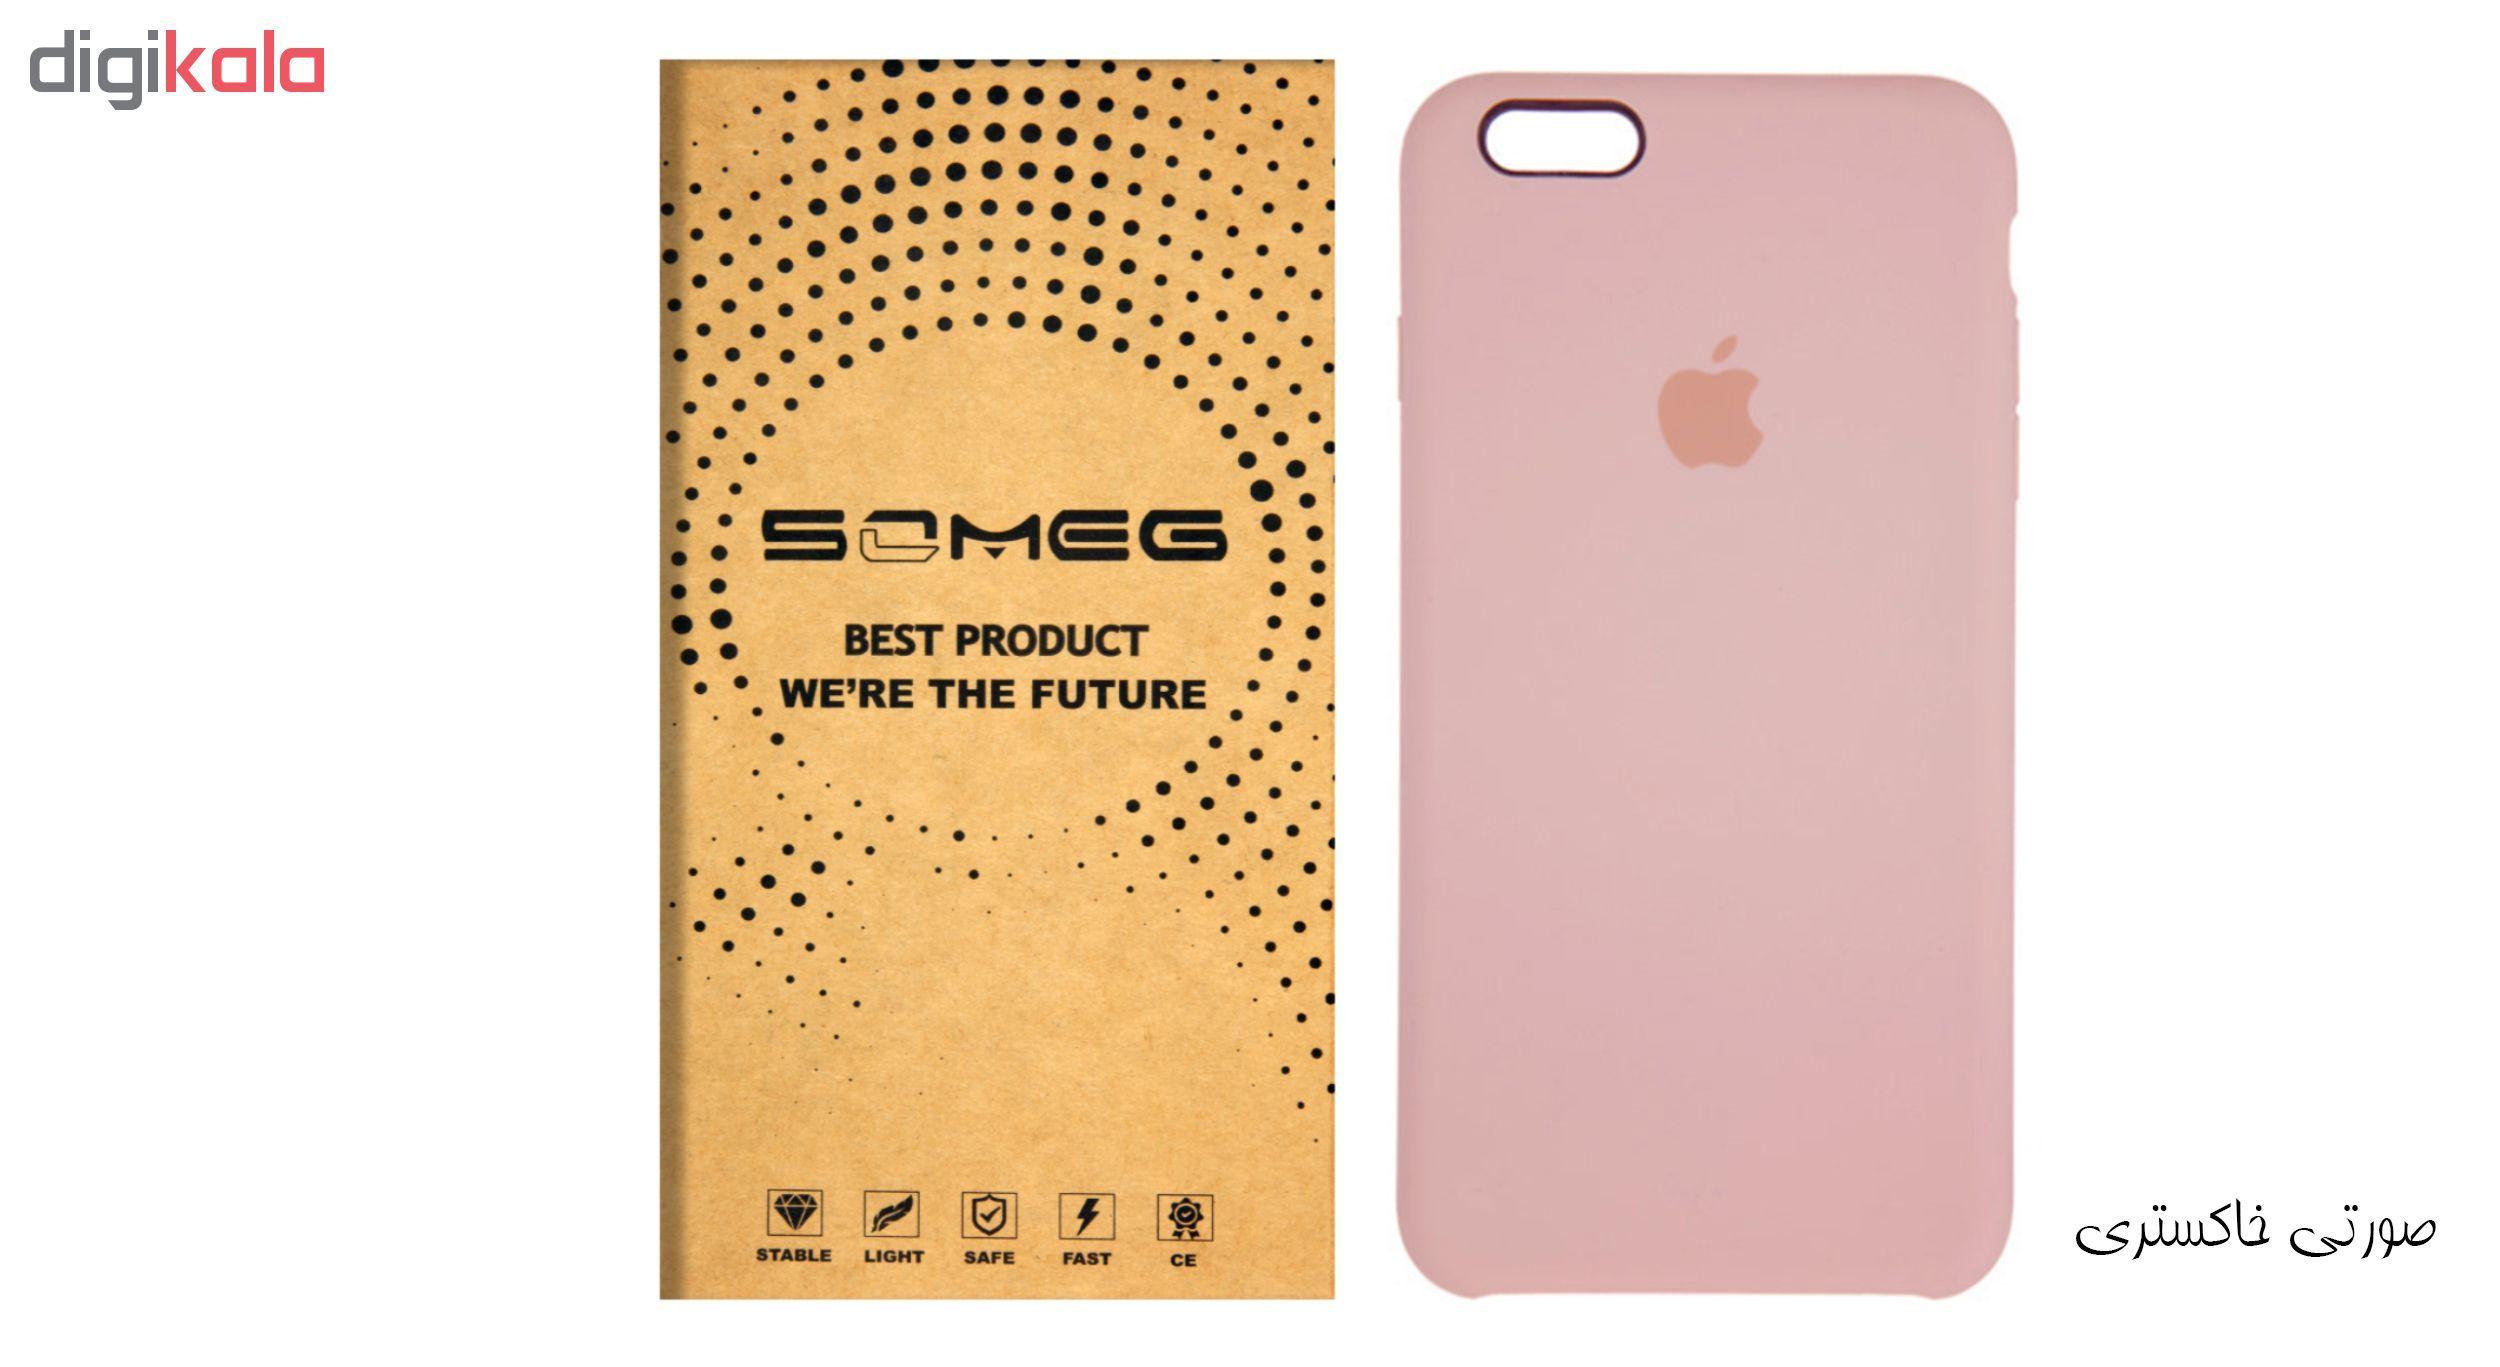 کاور سومگ مدل SIC مناسب برای گوشی موبایل اپل iPhone 6/6s main 1 18